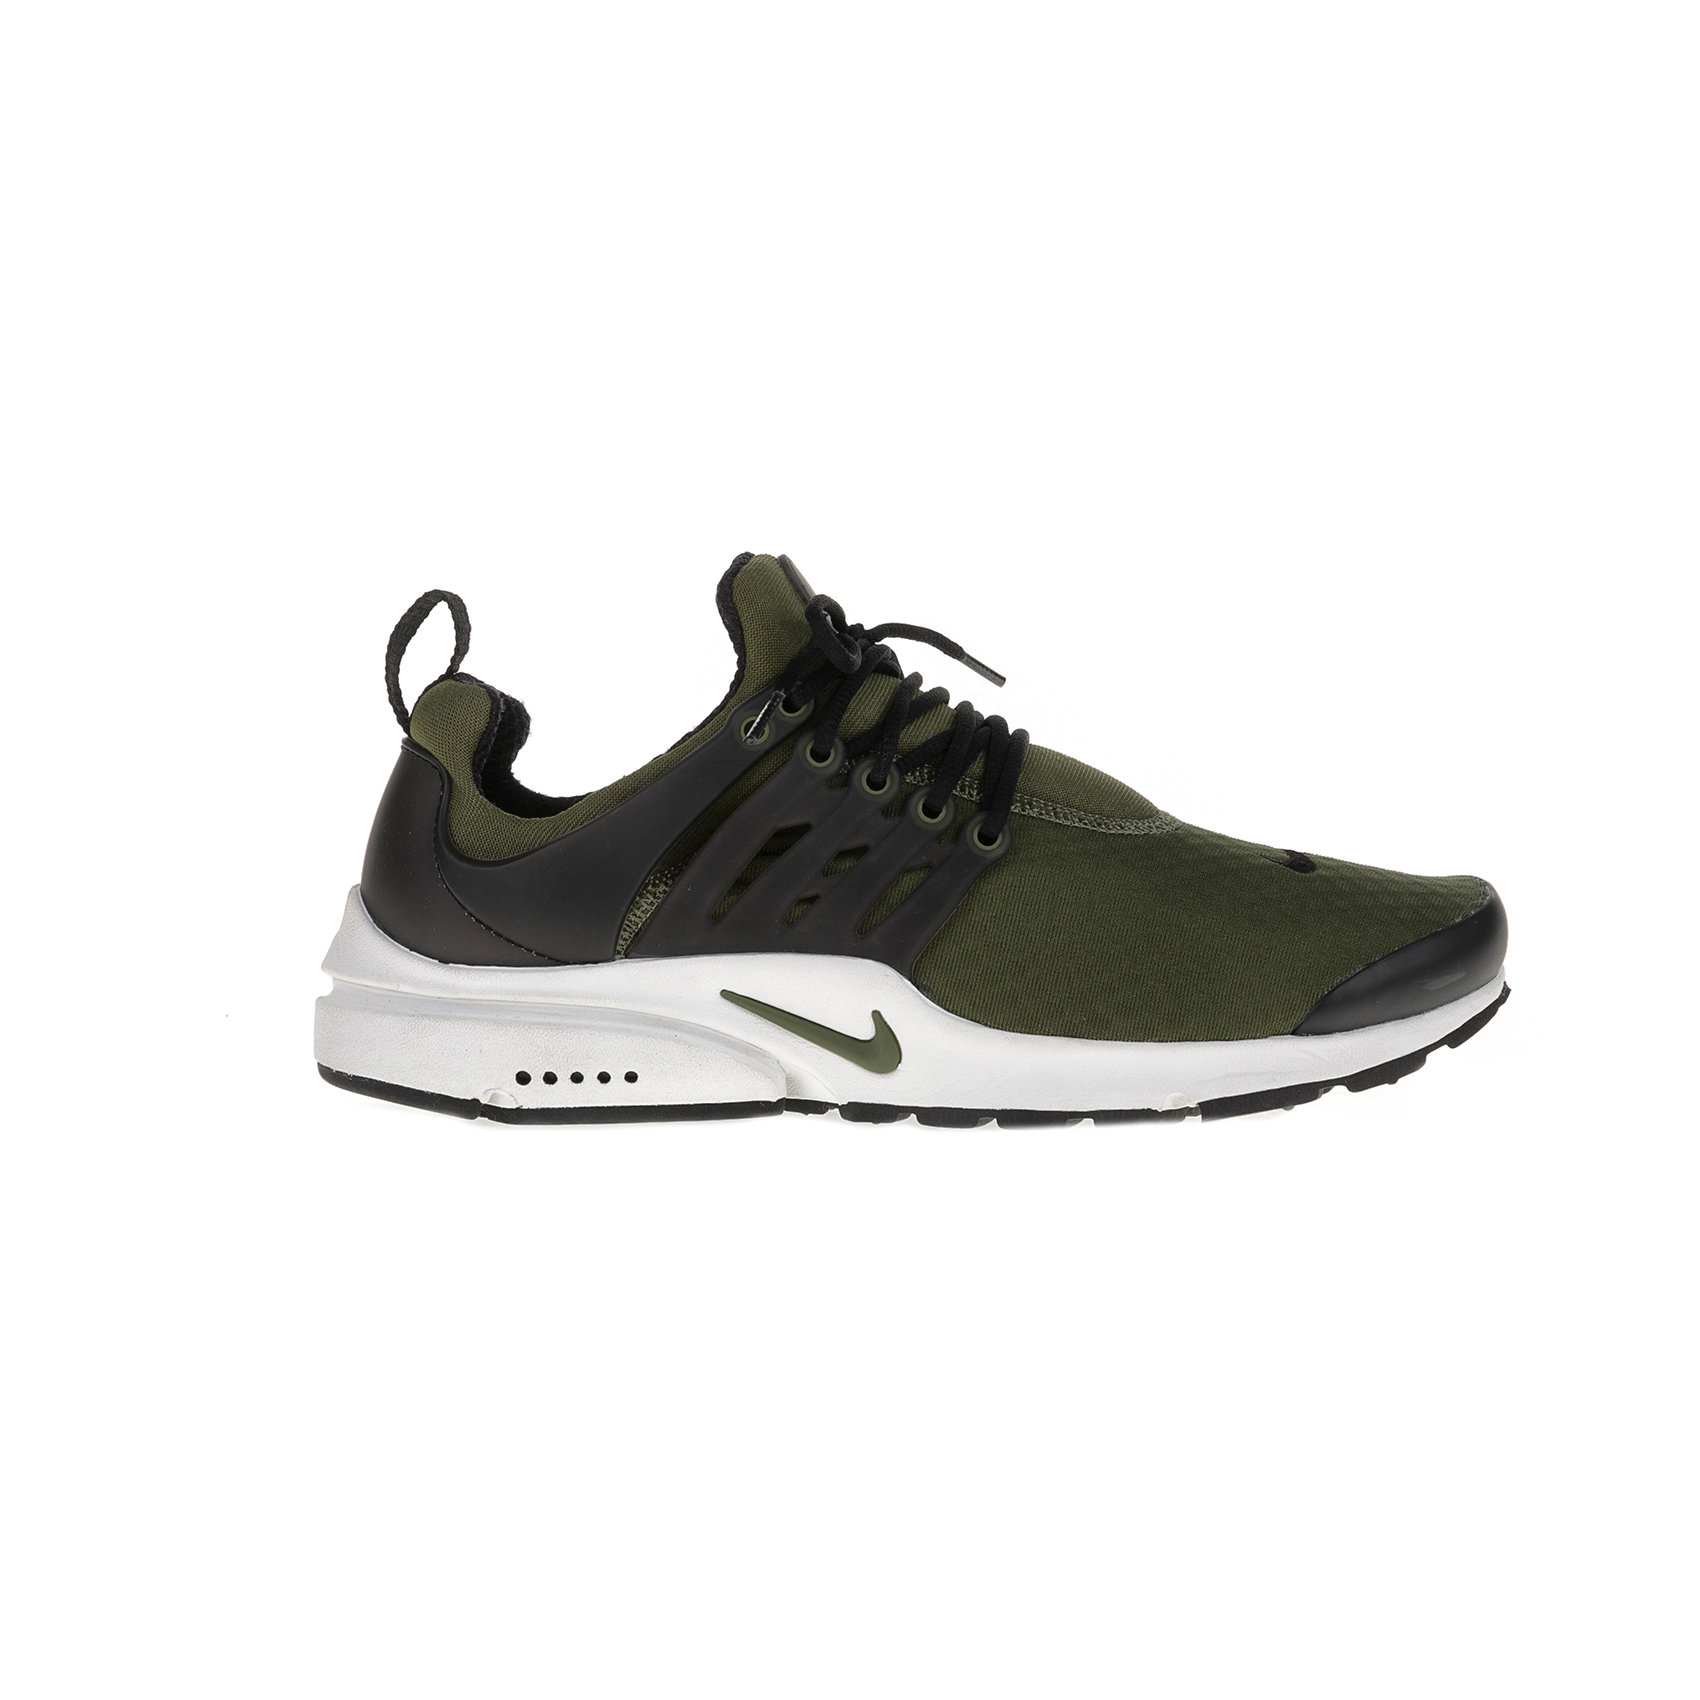 NIKE – Ανδρικά αθλητικά παπούτσια Nike AIR PRESTO ESSENTIAL χακί